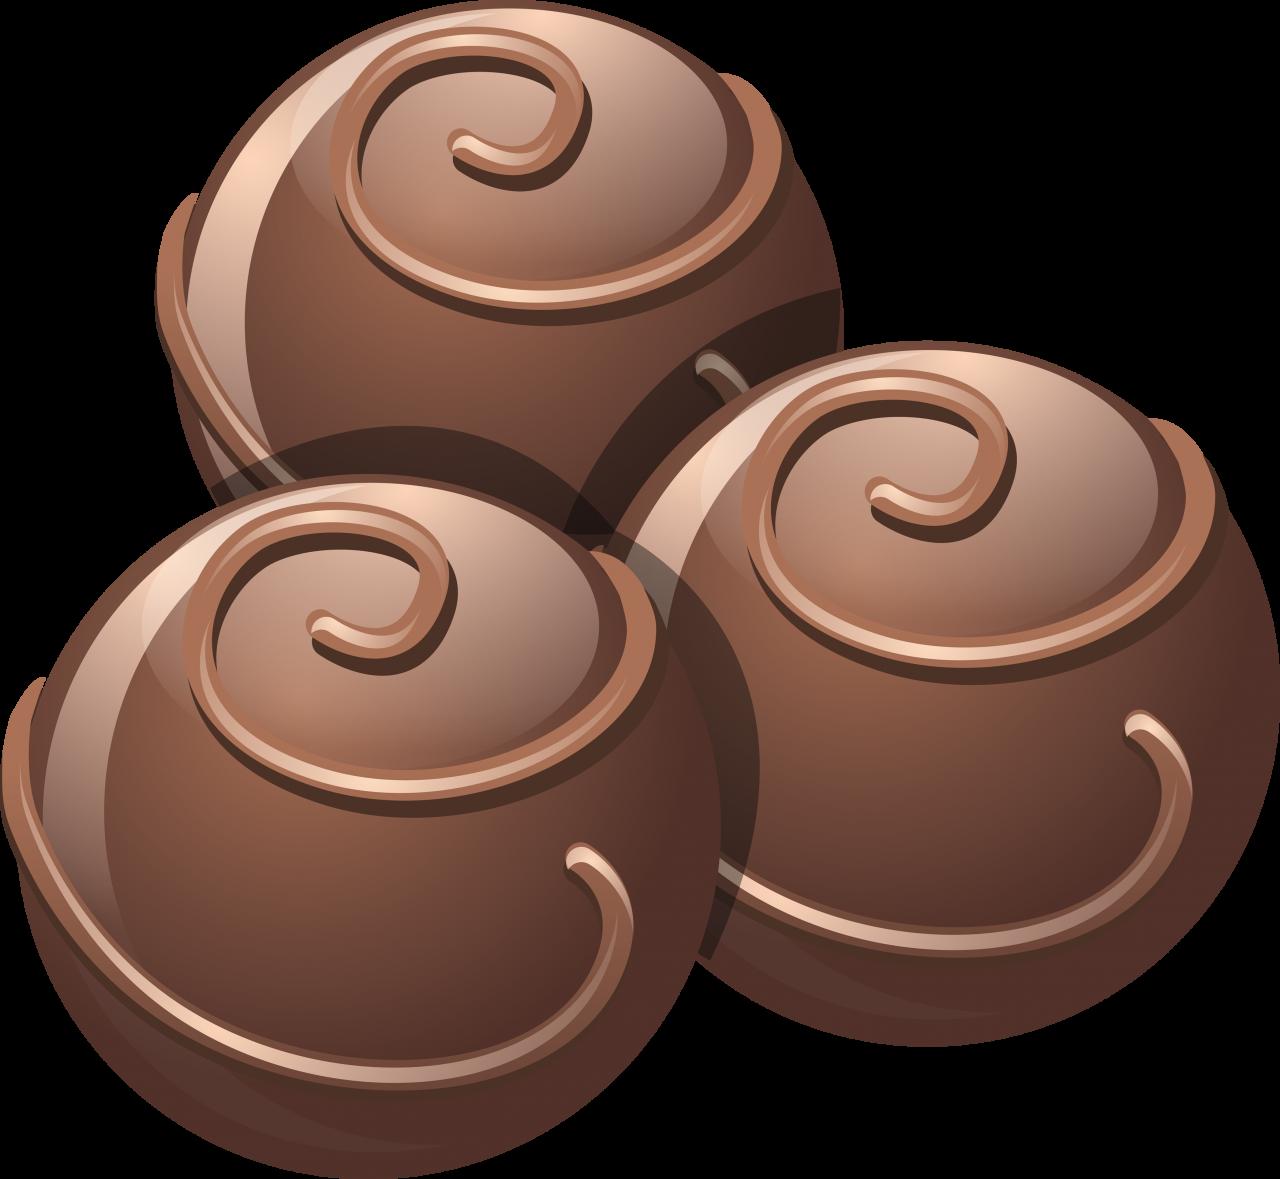 Dark Chocolate Scoops PNG Image